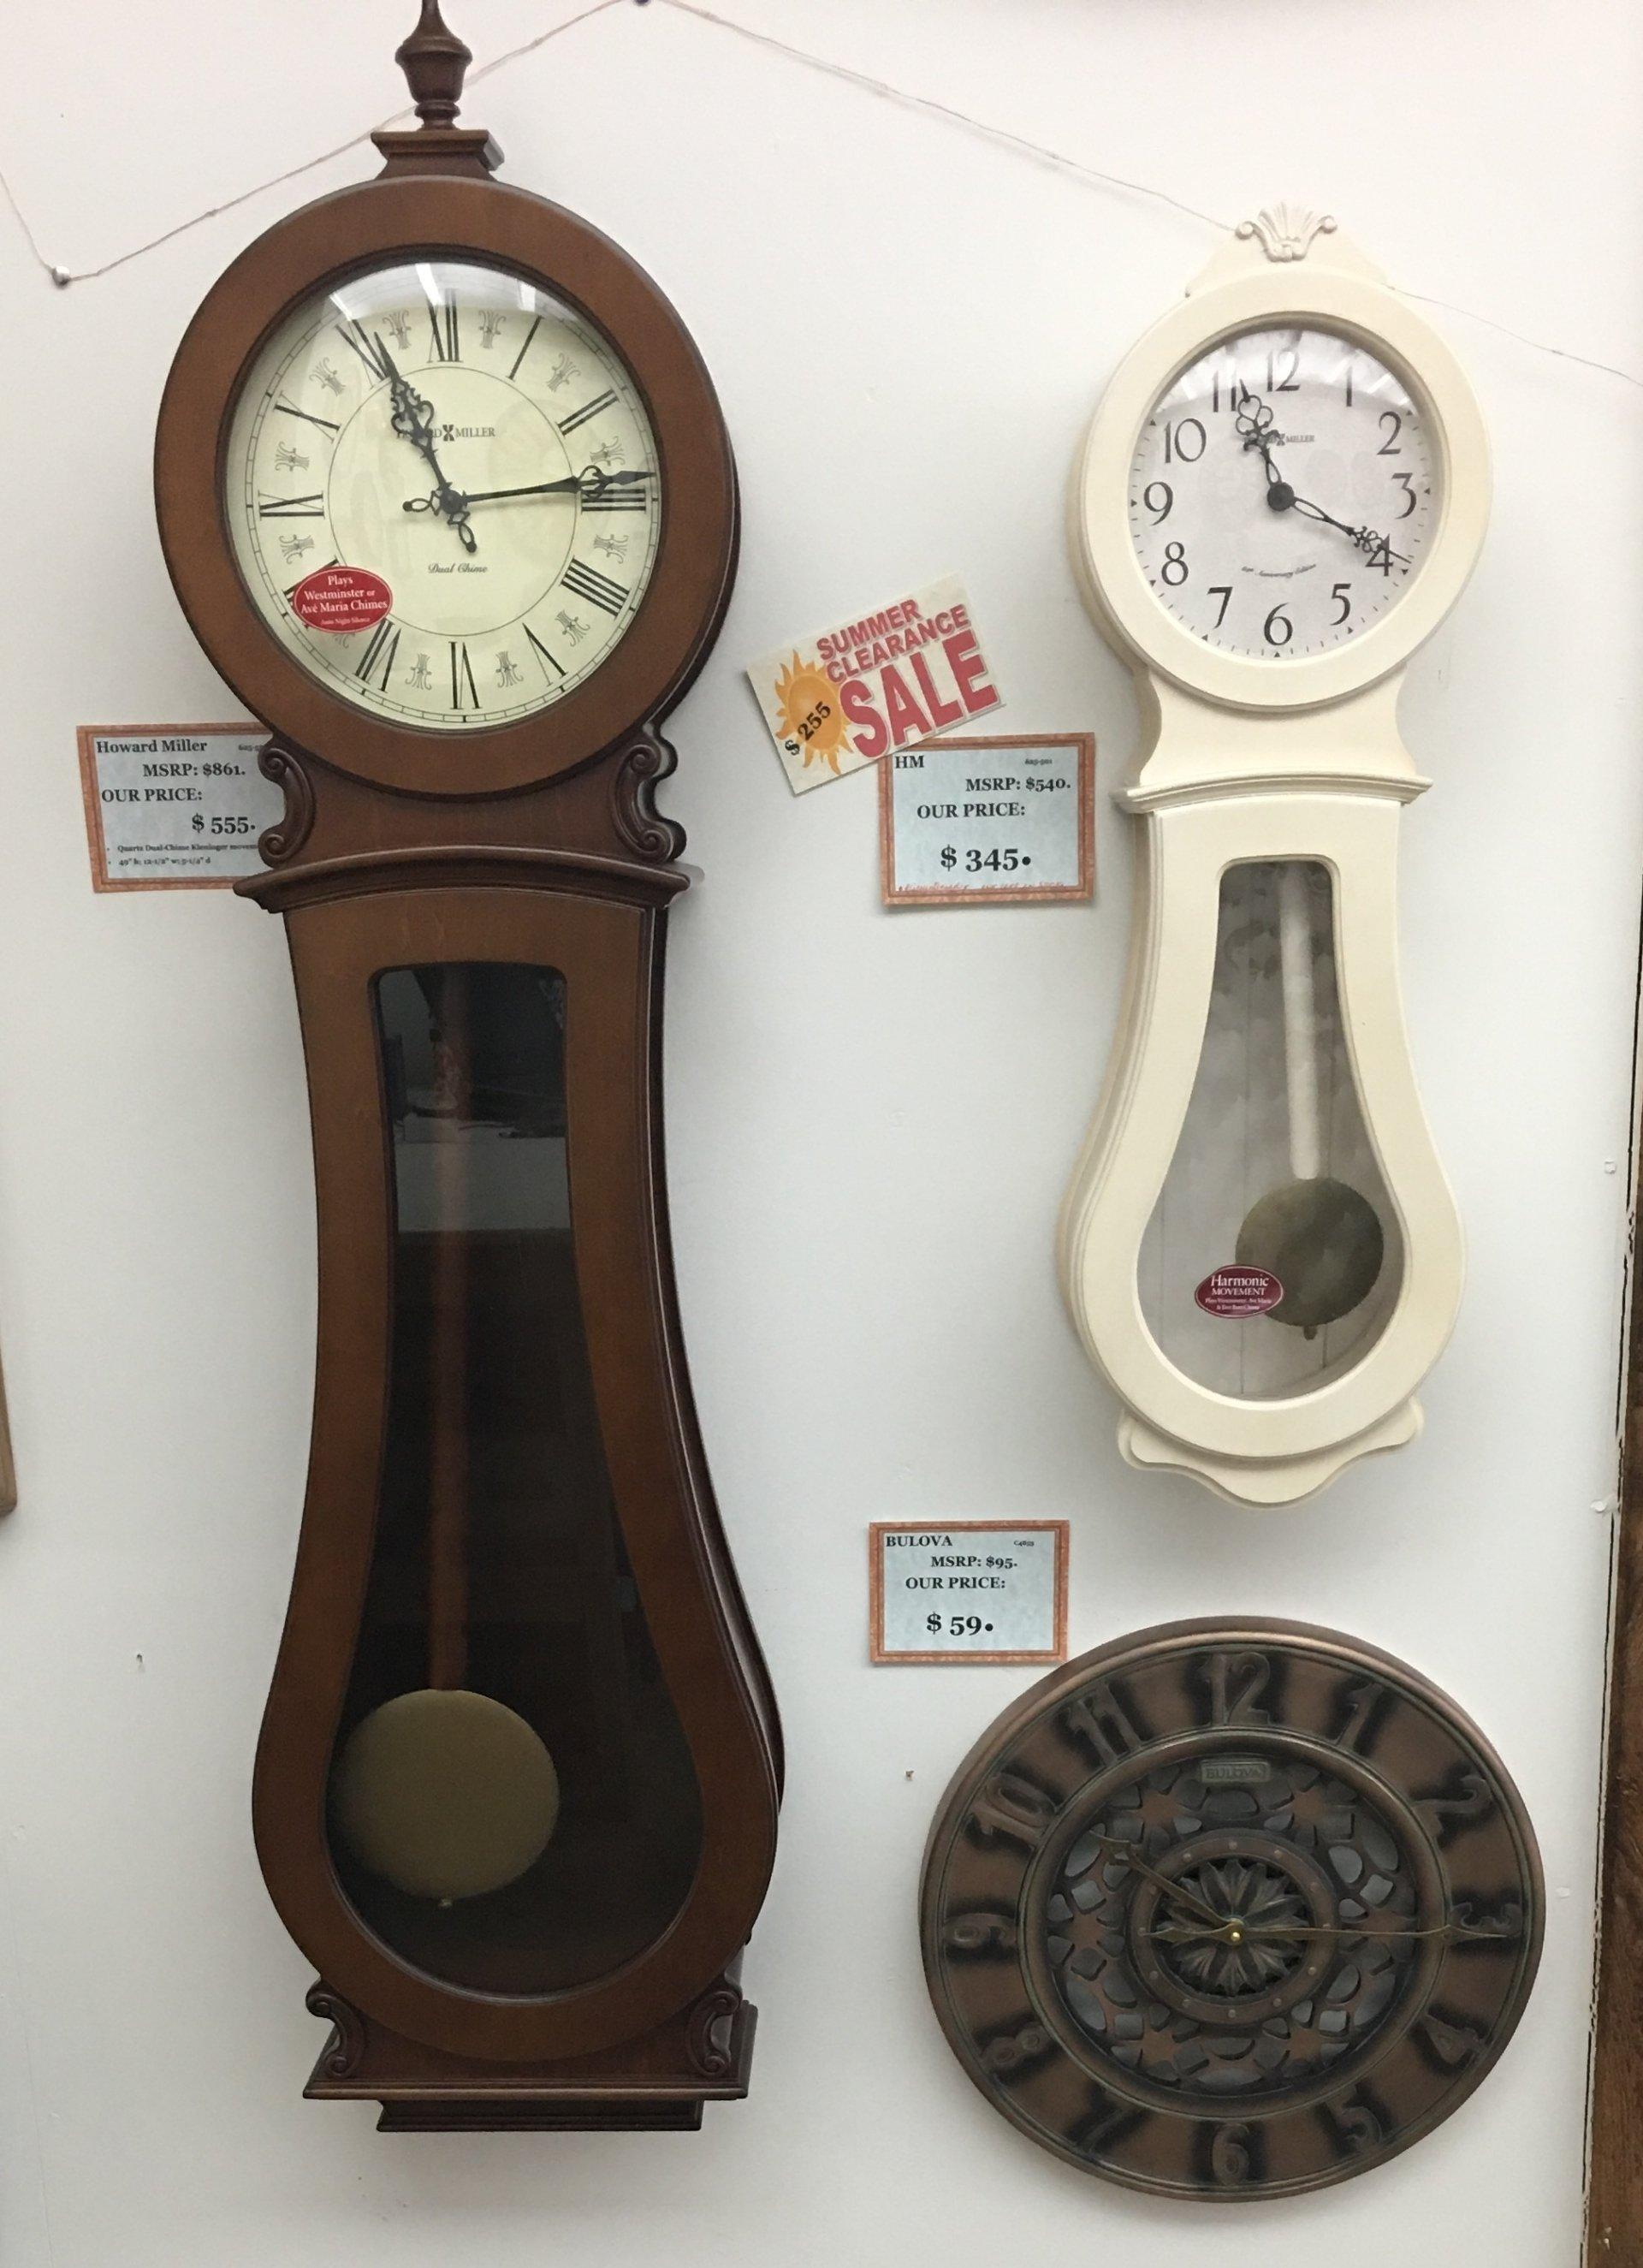 Clock Repairs and Sales | Austin, TX | McGuire's Clocks